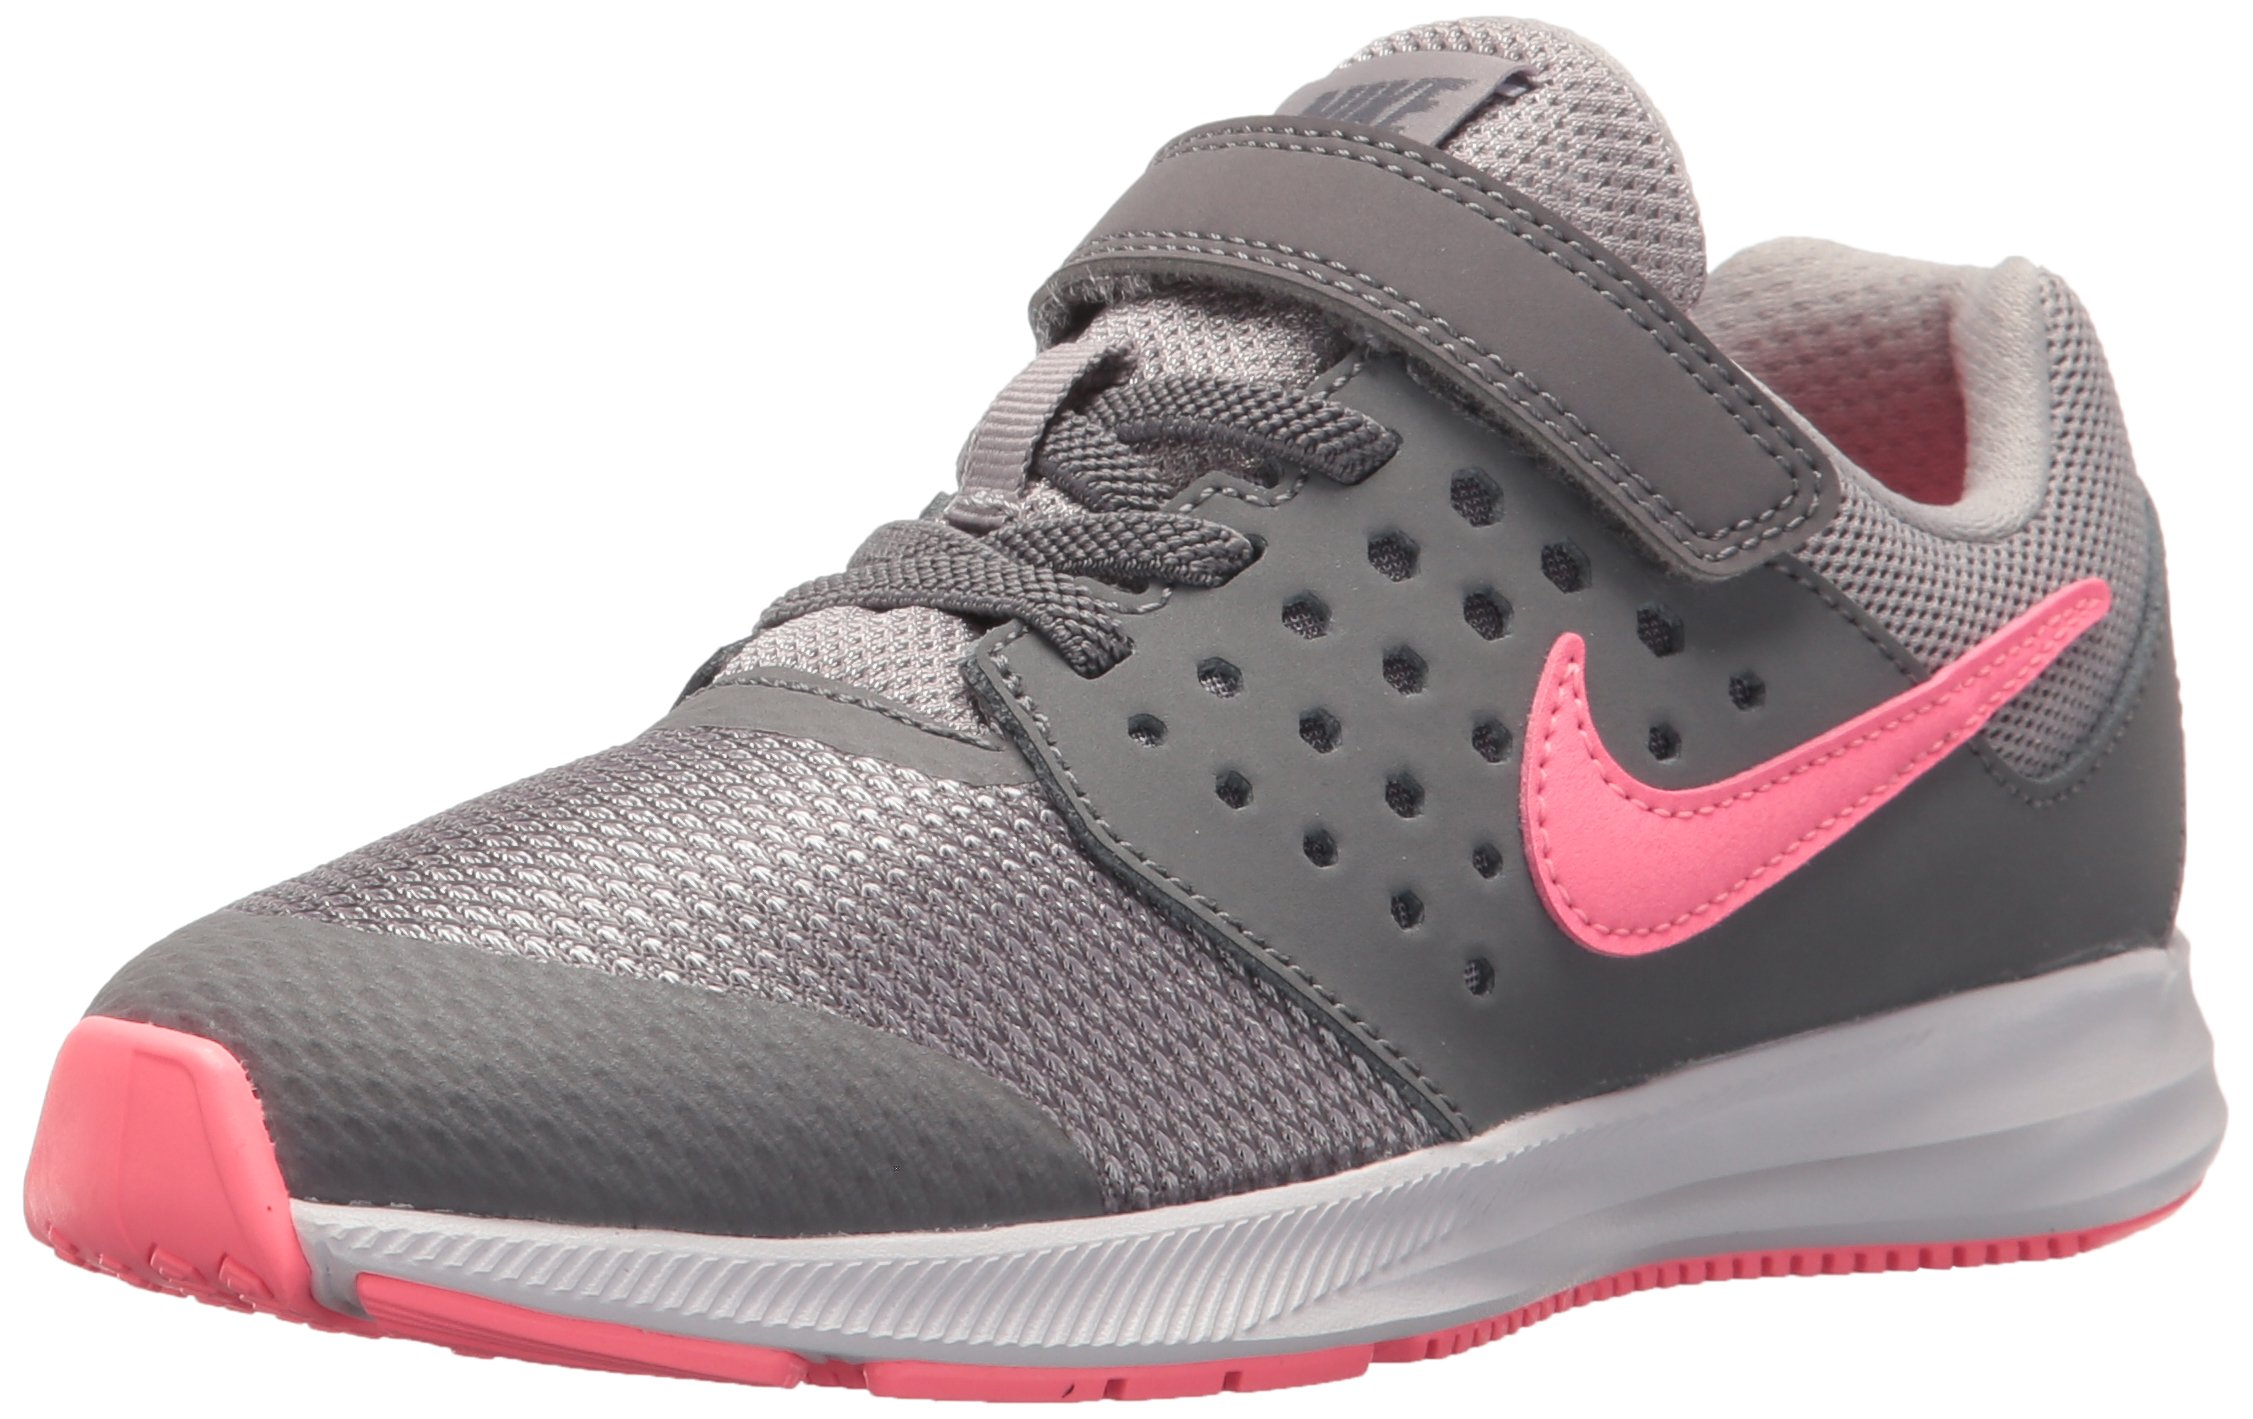 Nike Girls' Downshifter 7 (PSV) Running Shoe Gunsmoke/Sunset Pulse - Atmosphere Grey 1 M US Little Kid by Nike (Image #1)